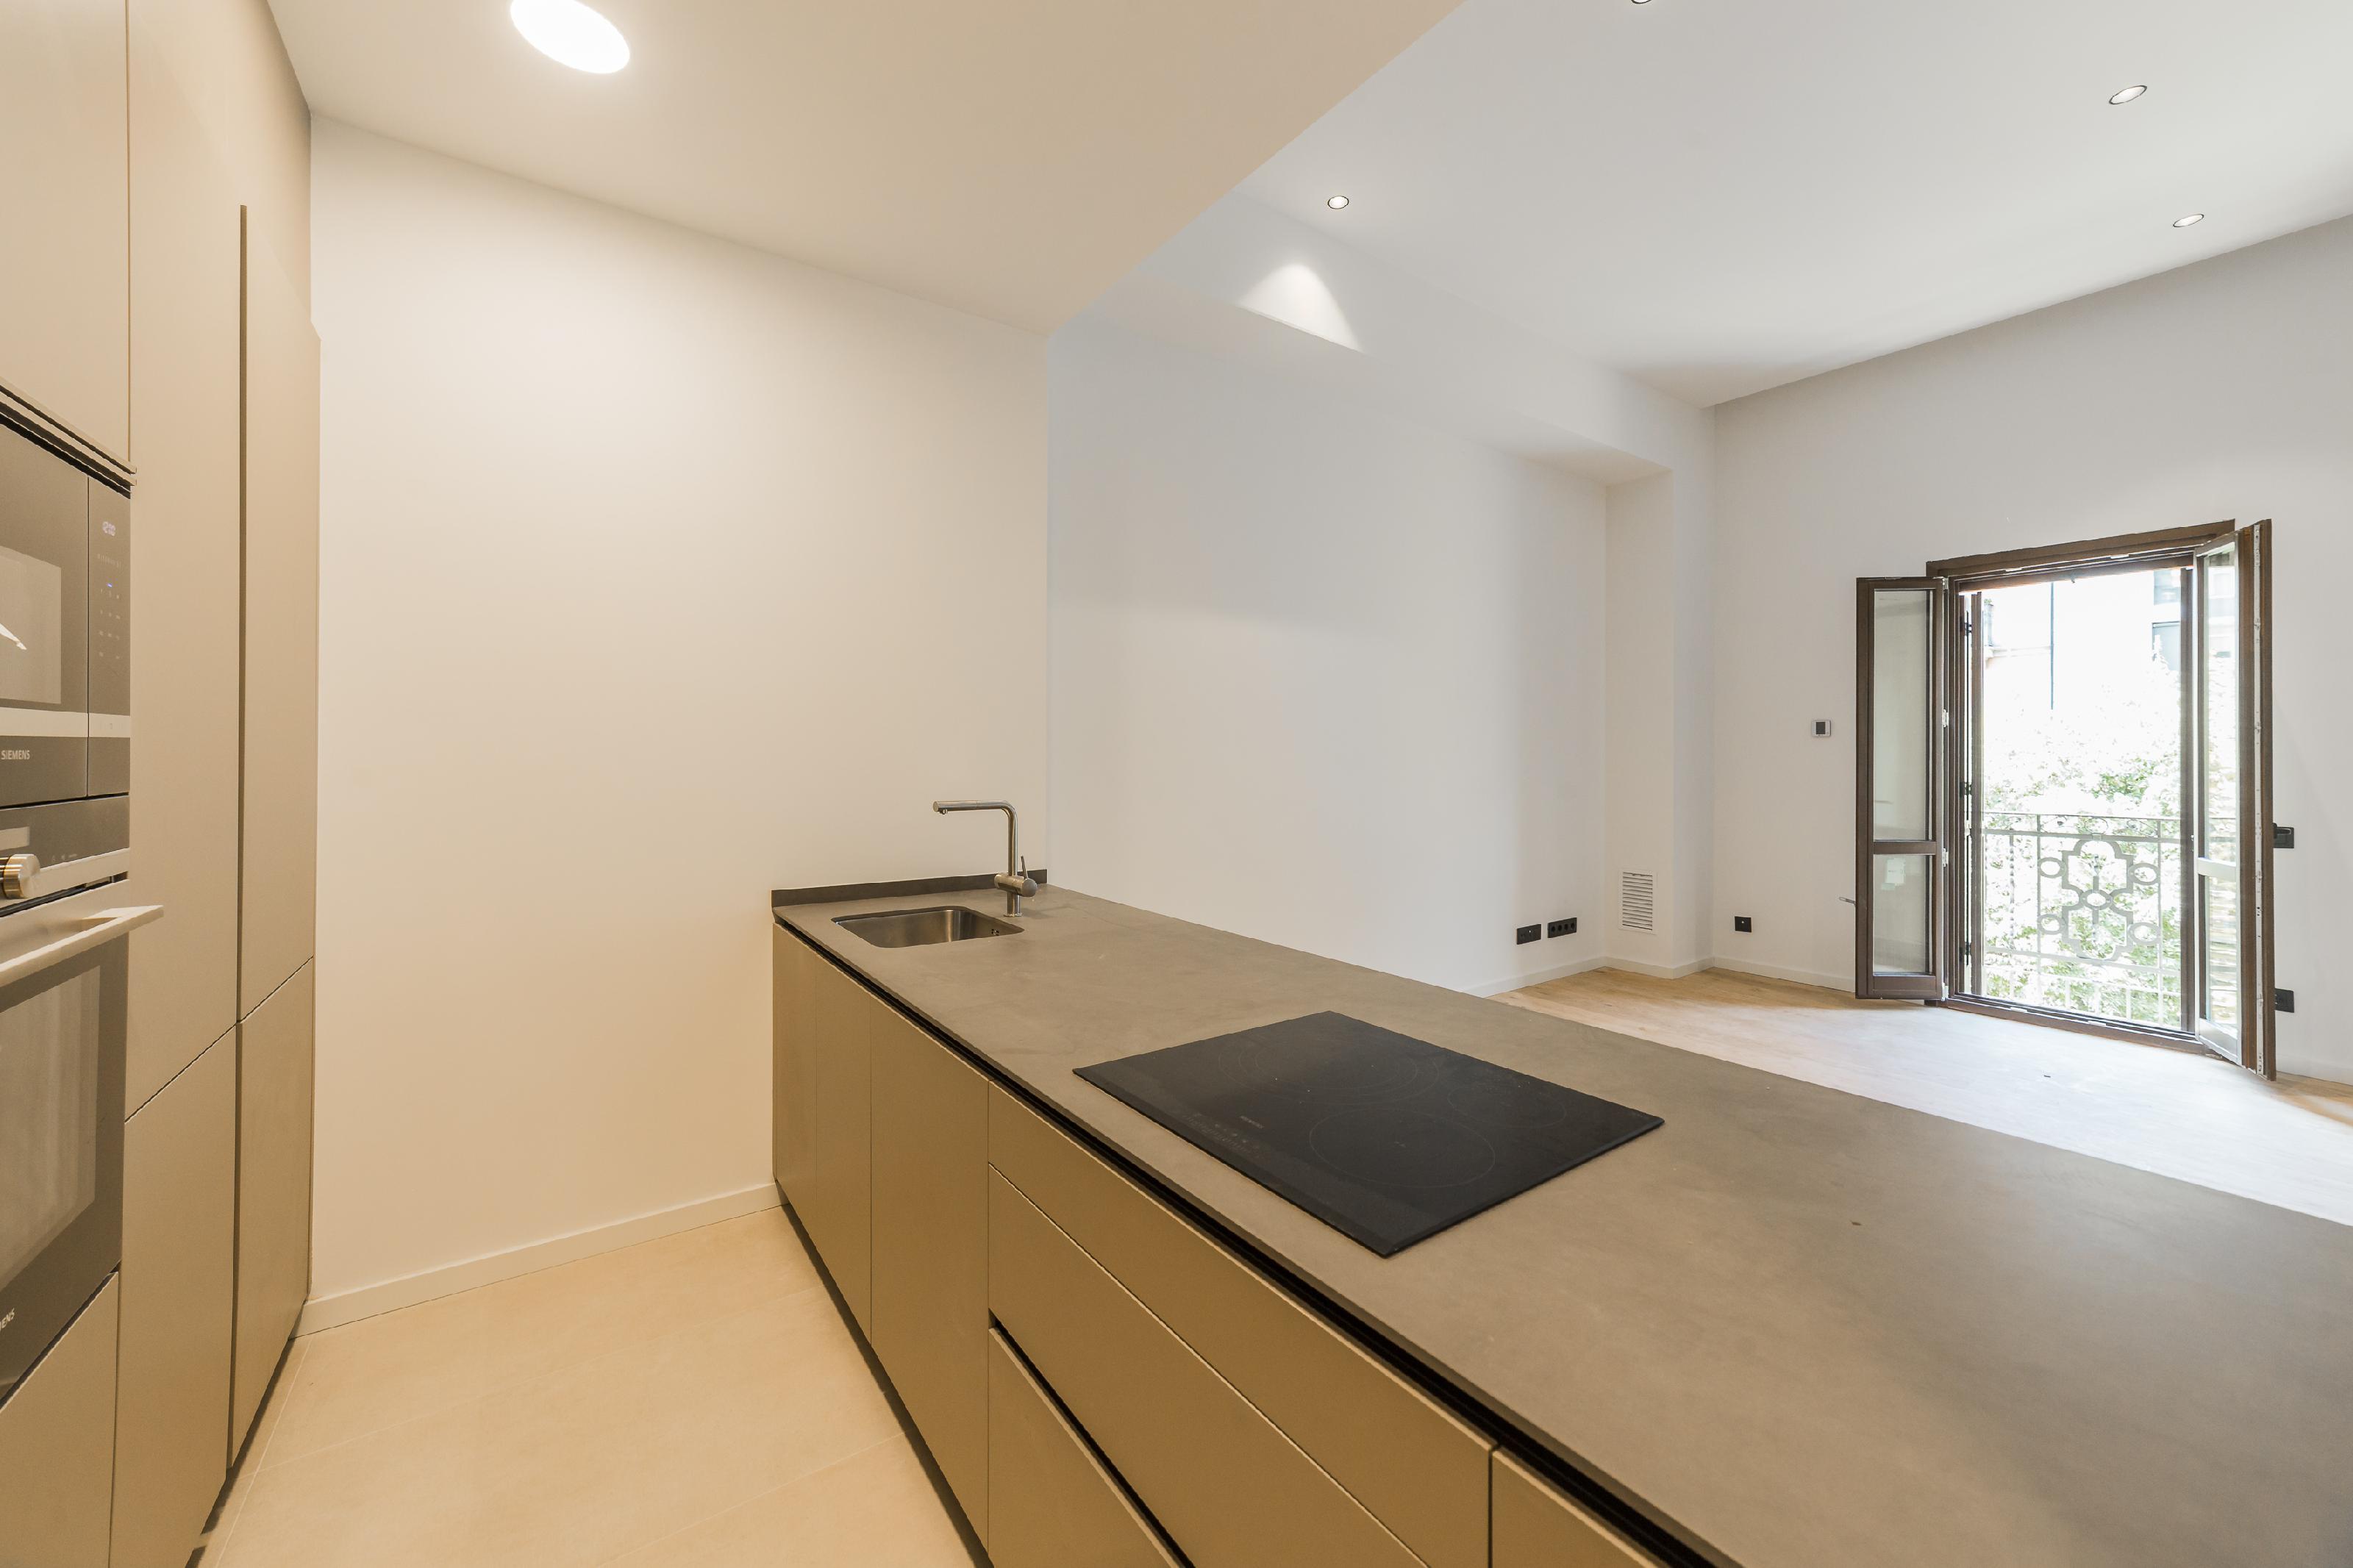 182456 Apartamento en venda en Eixample, Antiga Esquerre Eixample 12